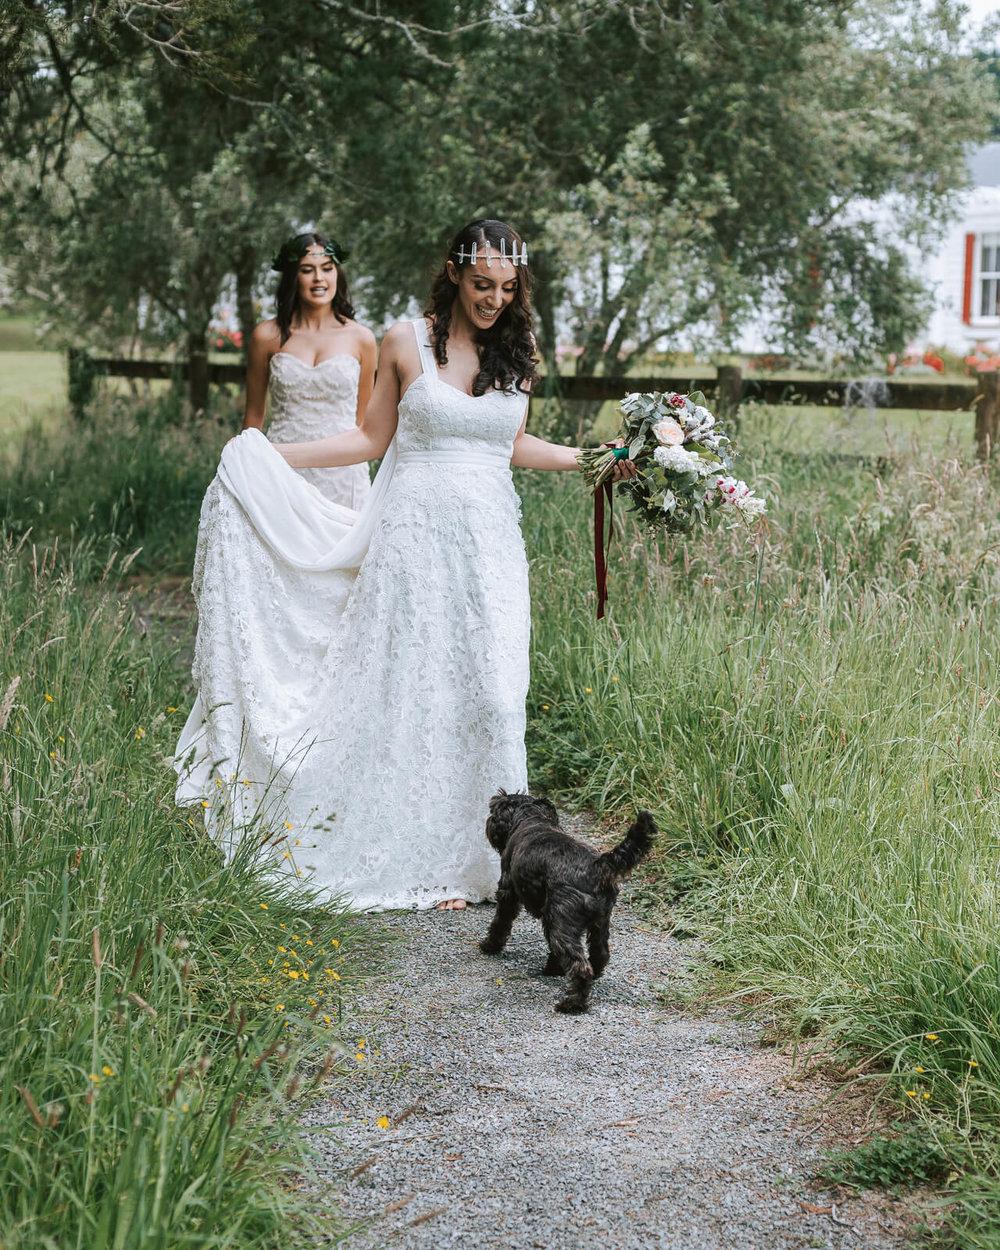 elizabeth may bridal DSC_1525_EmmaSkye.jpg